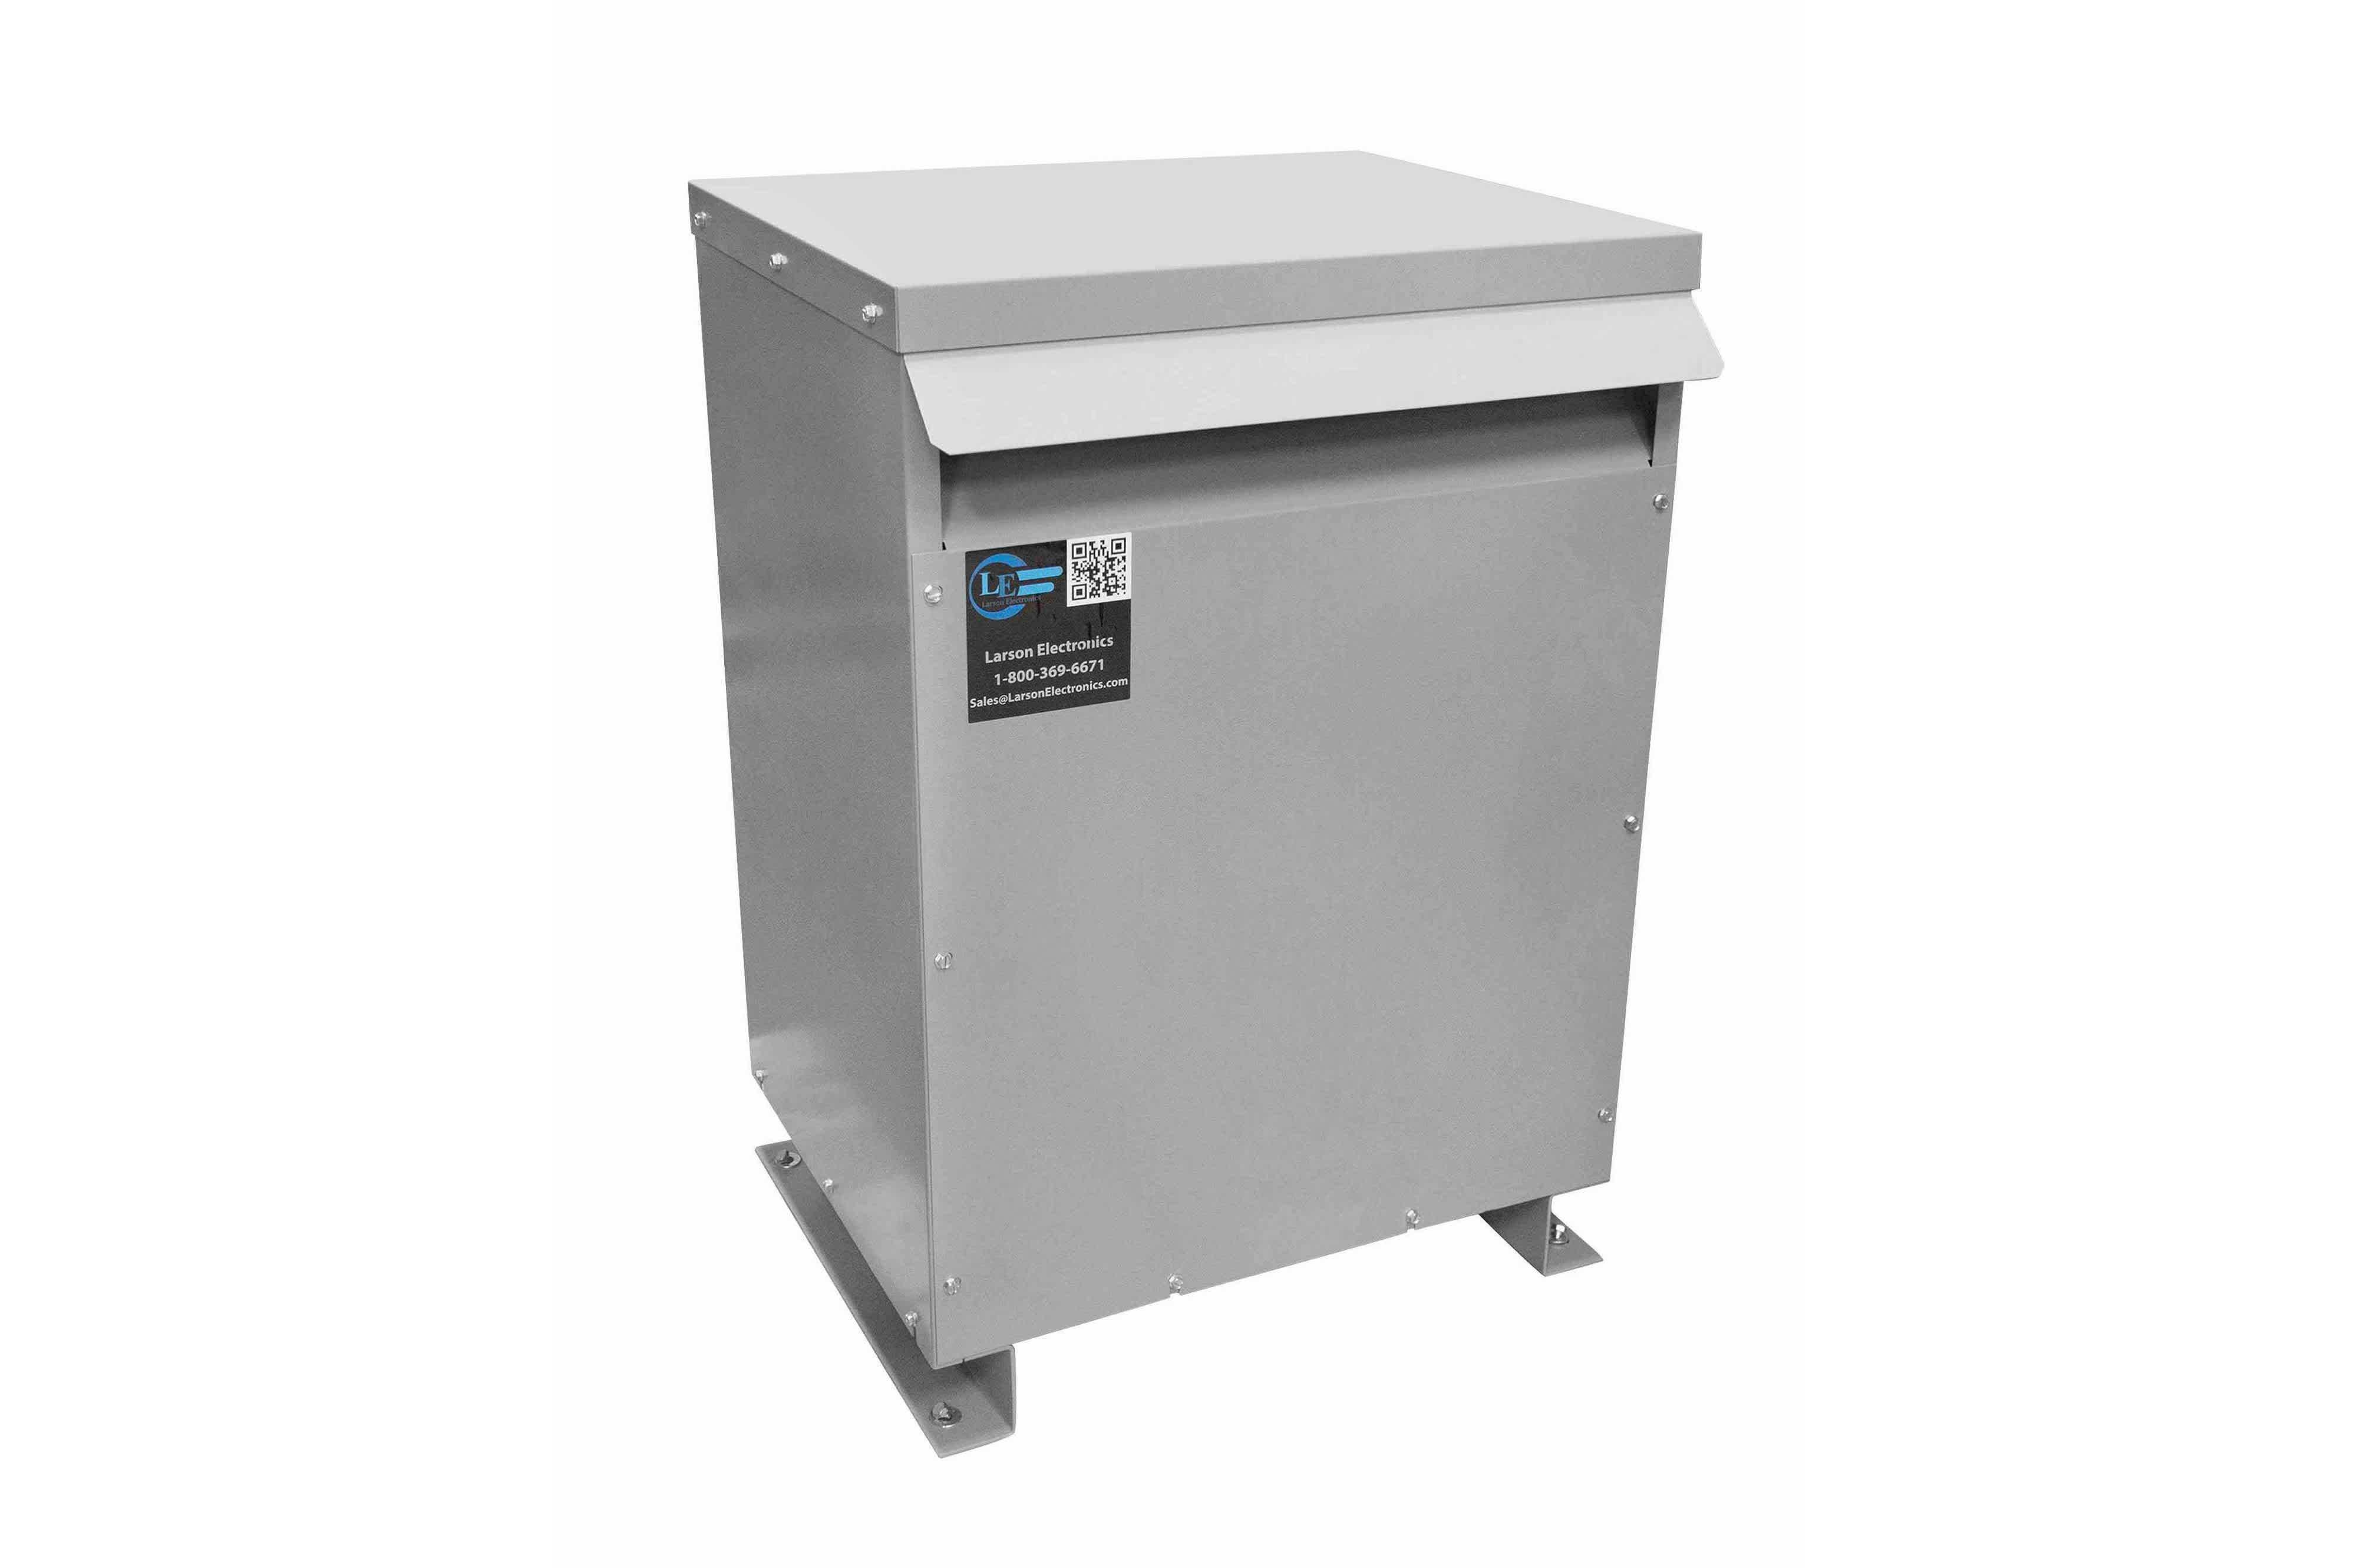 90 kVA 3PH Isolation Transformer, 240V Wye Primary, 600Y/347 Wye-N Secondary, N3R, Ventilated, 60 Hz